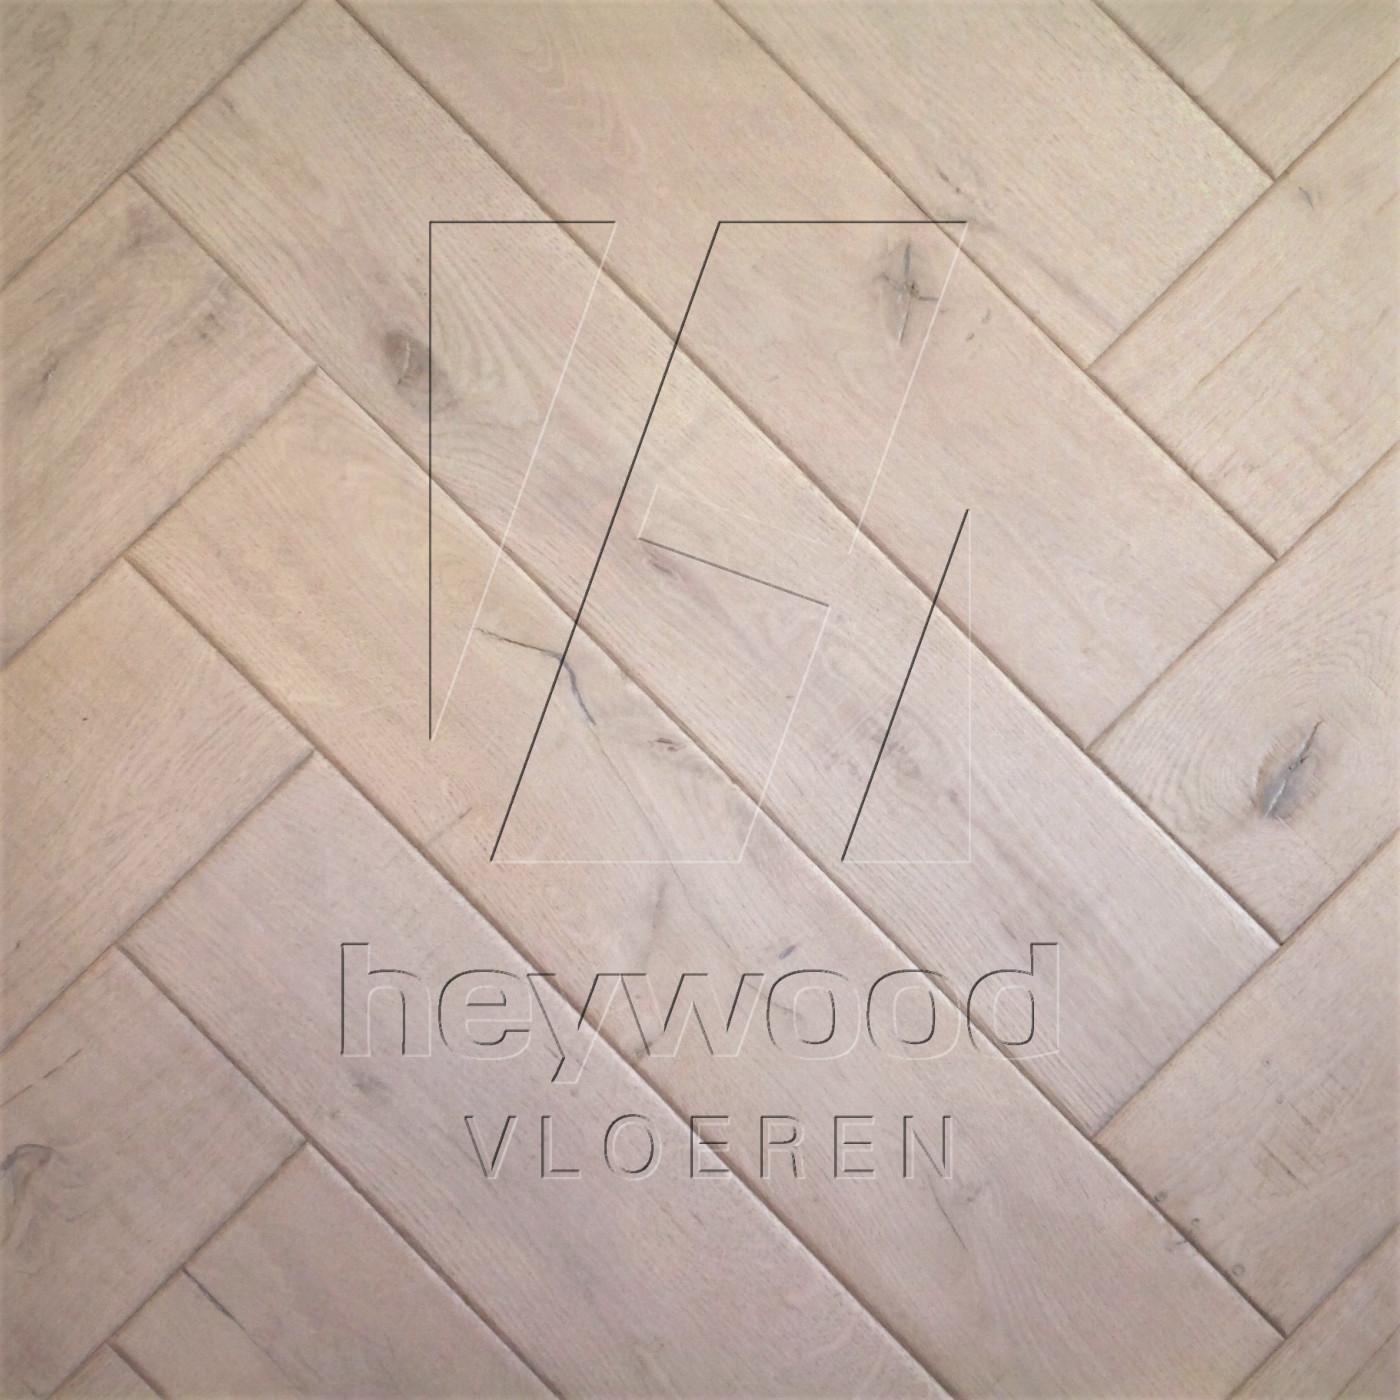 Shrunk Herringbone 'Yosemite' in Herringbone of Pattern & Panel Floors